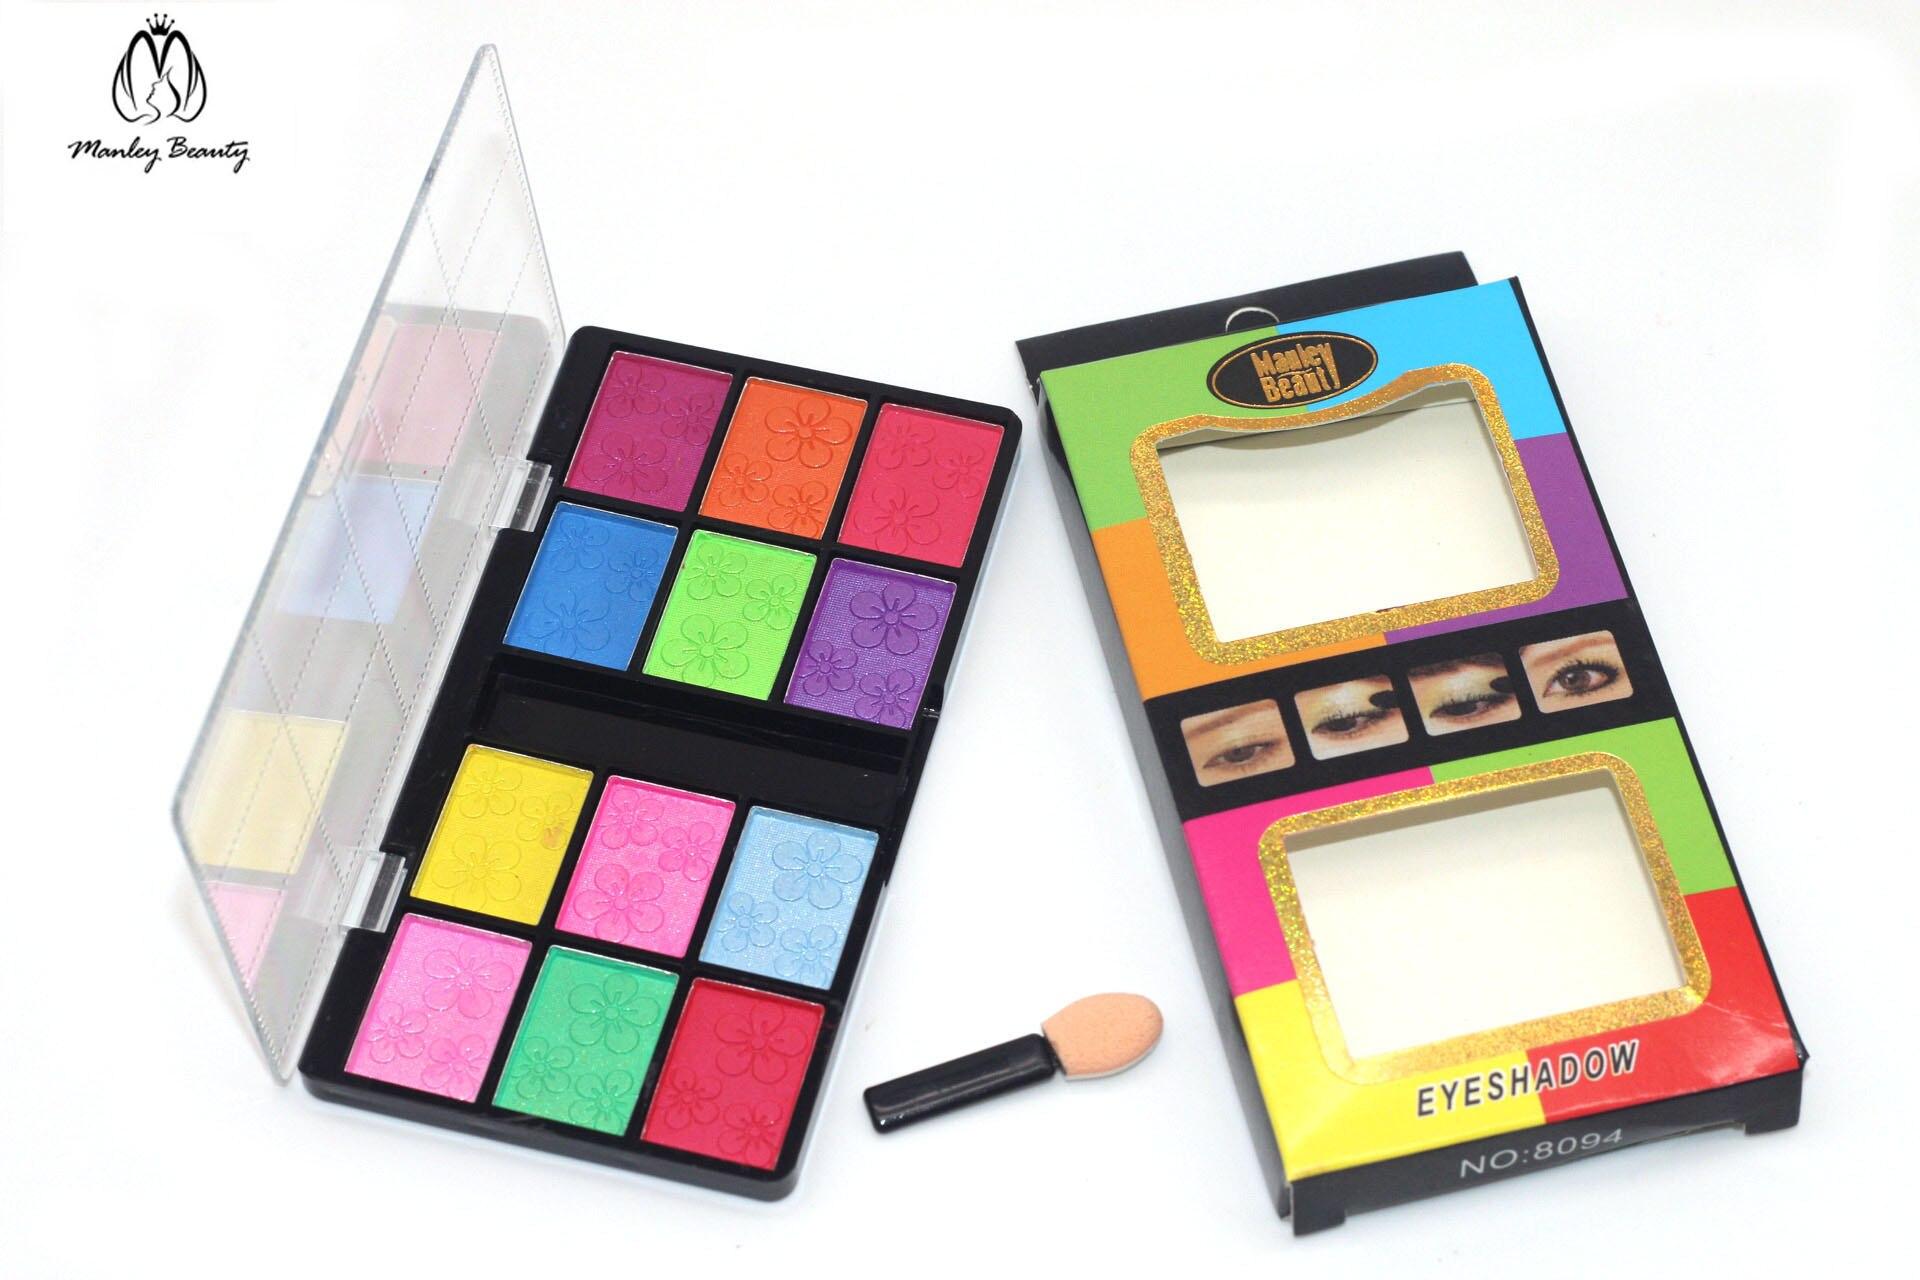 12 Color Matte Eyeshadow Eye Makeup Waterproof Mineral Powder Shimmer Eye Shadow Make Up Palette Cosmetics For Women